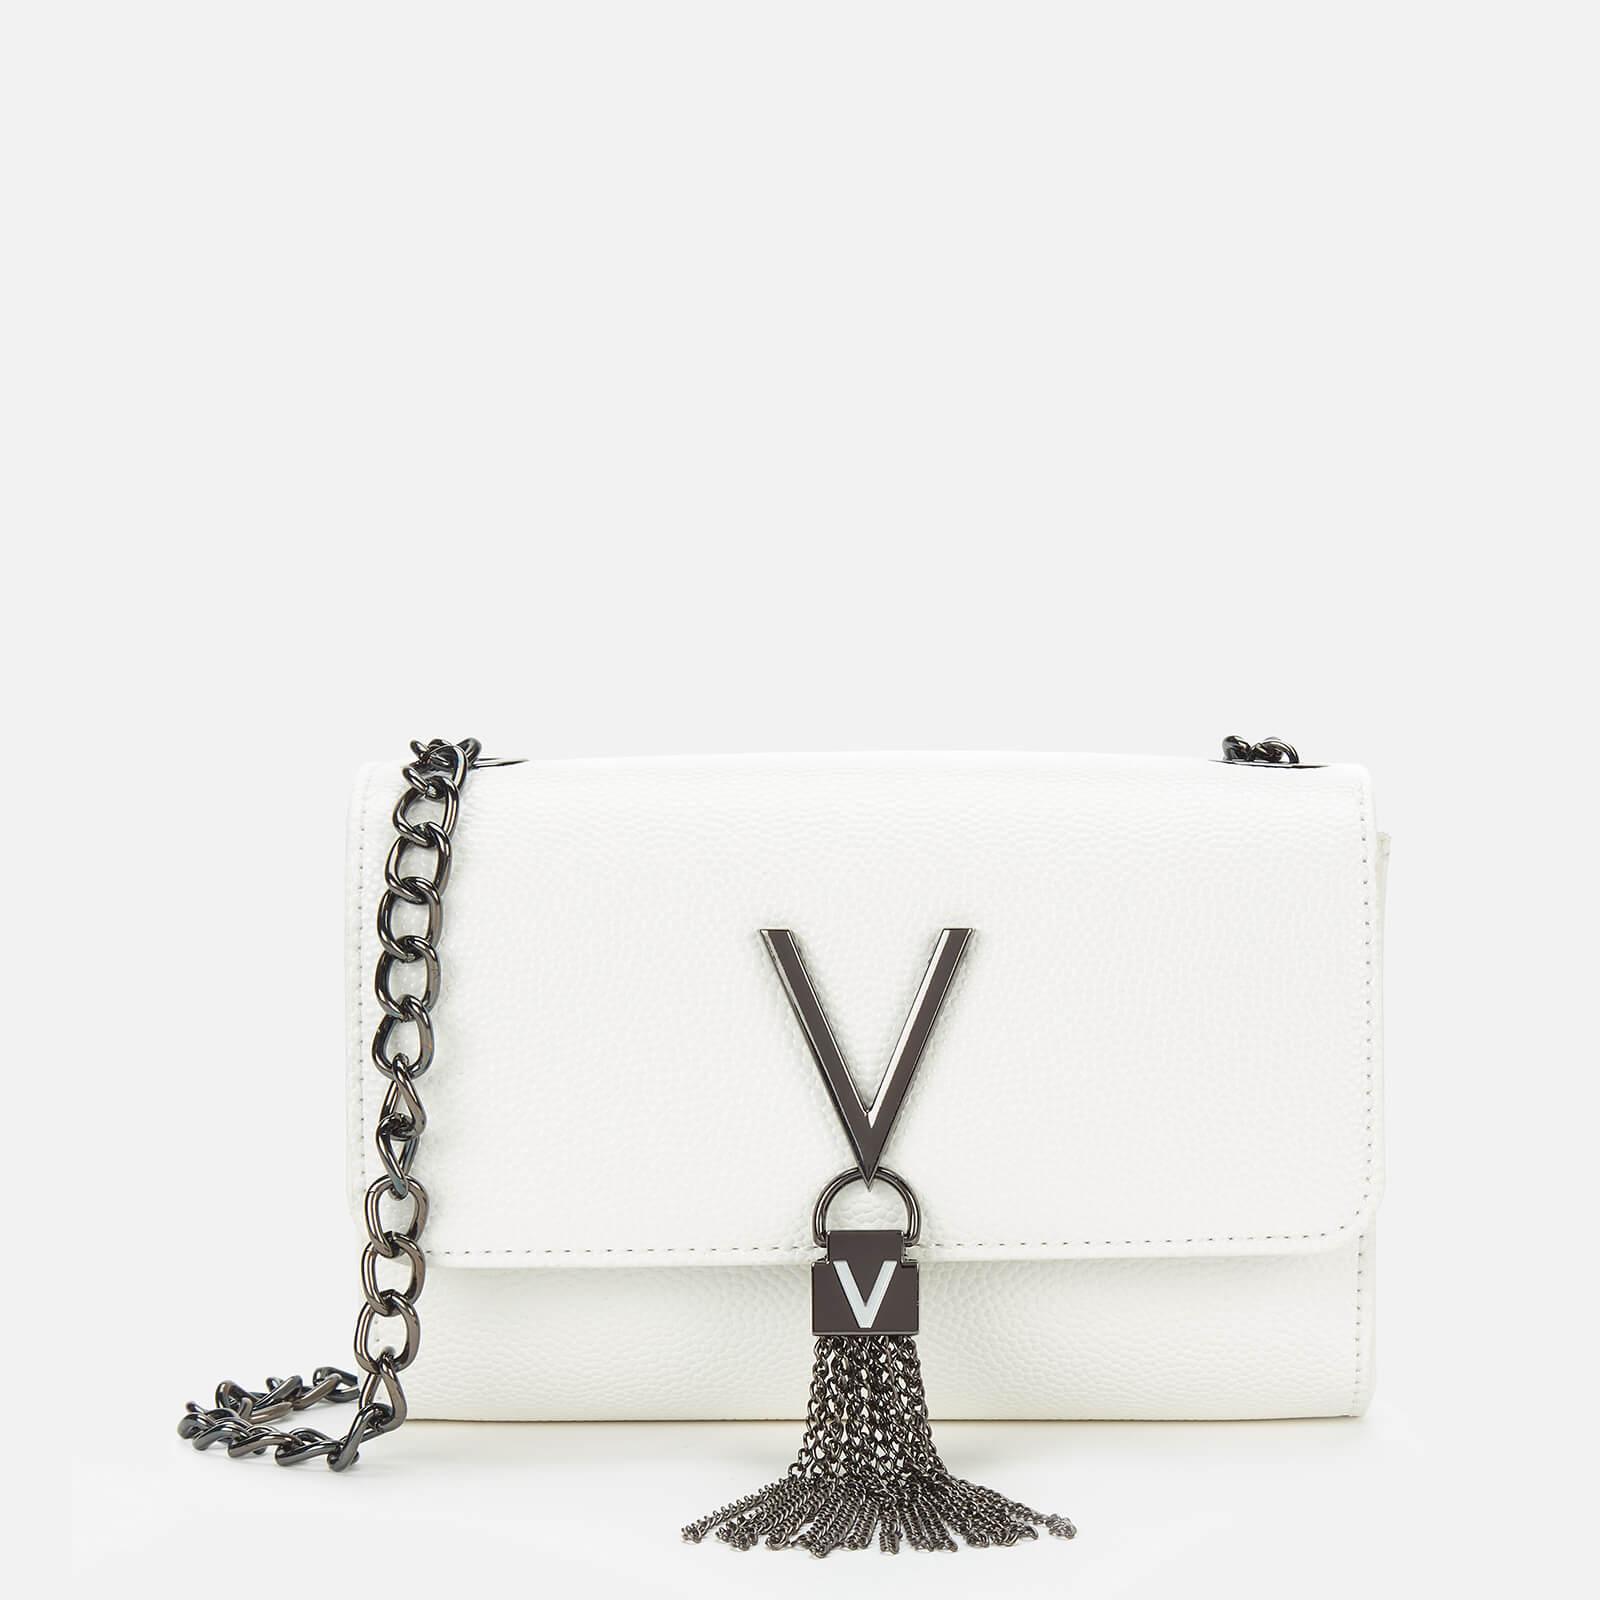 Valentino Bags Women's Divina Small Shoulder Bag - White